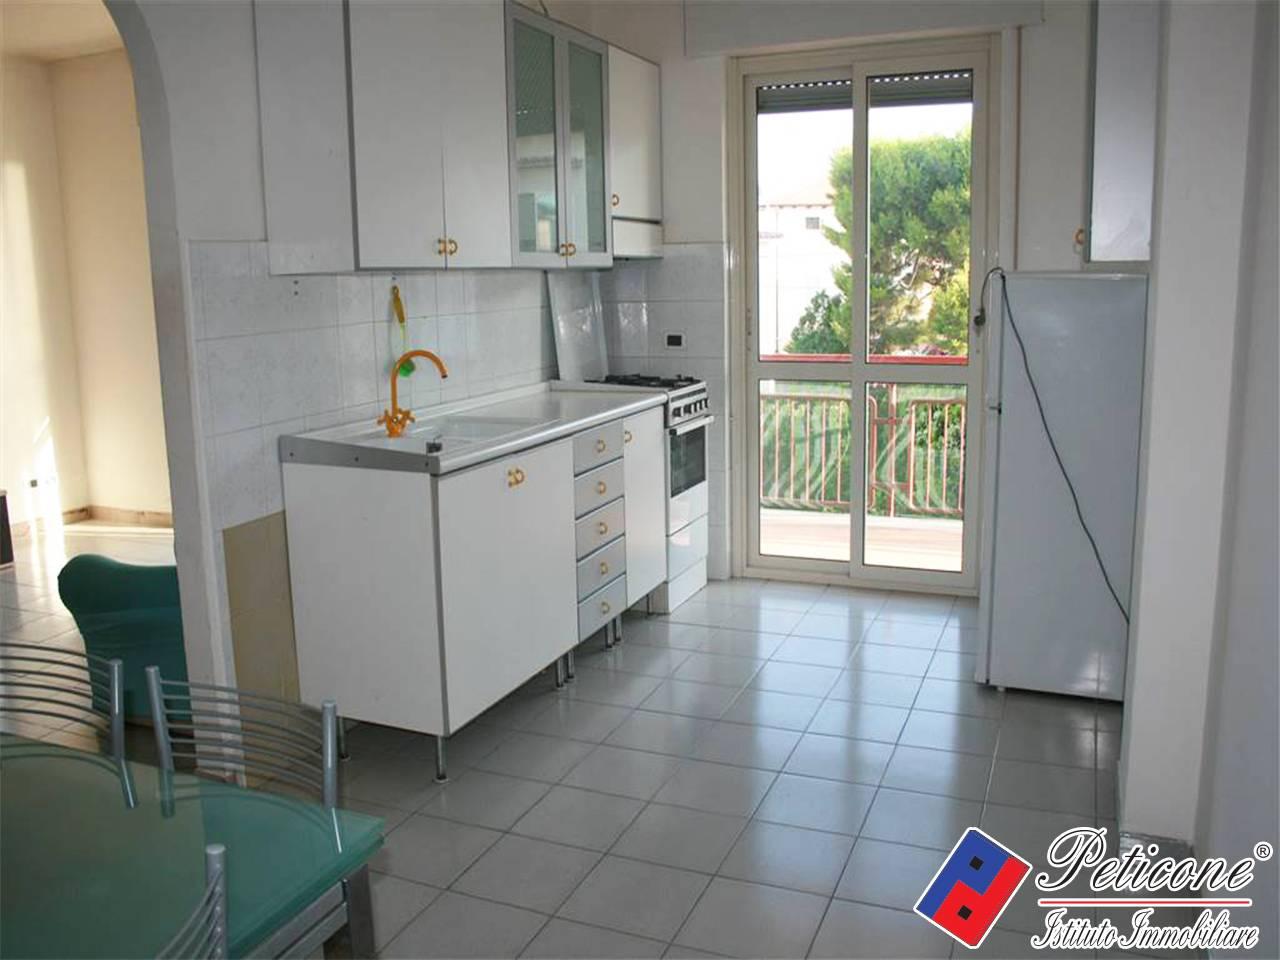 Appartamento in Vendita a Gaeta: 4 locali, 91 mq - Foto 4